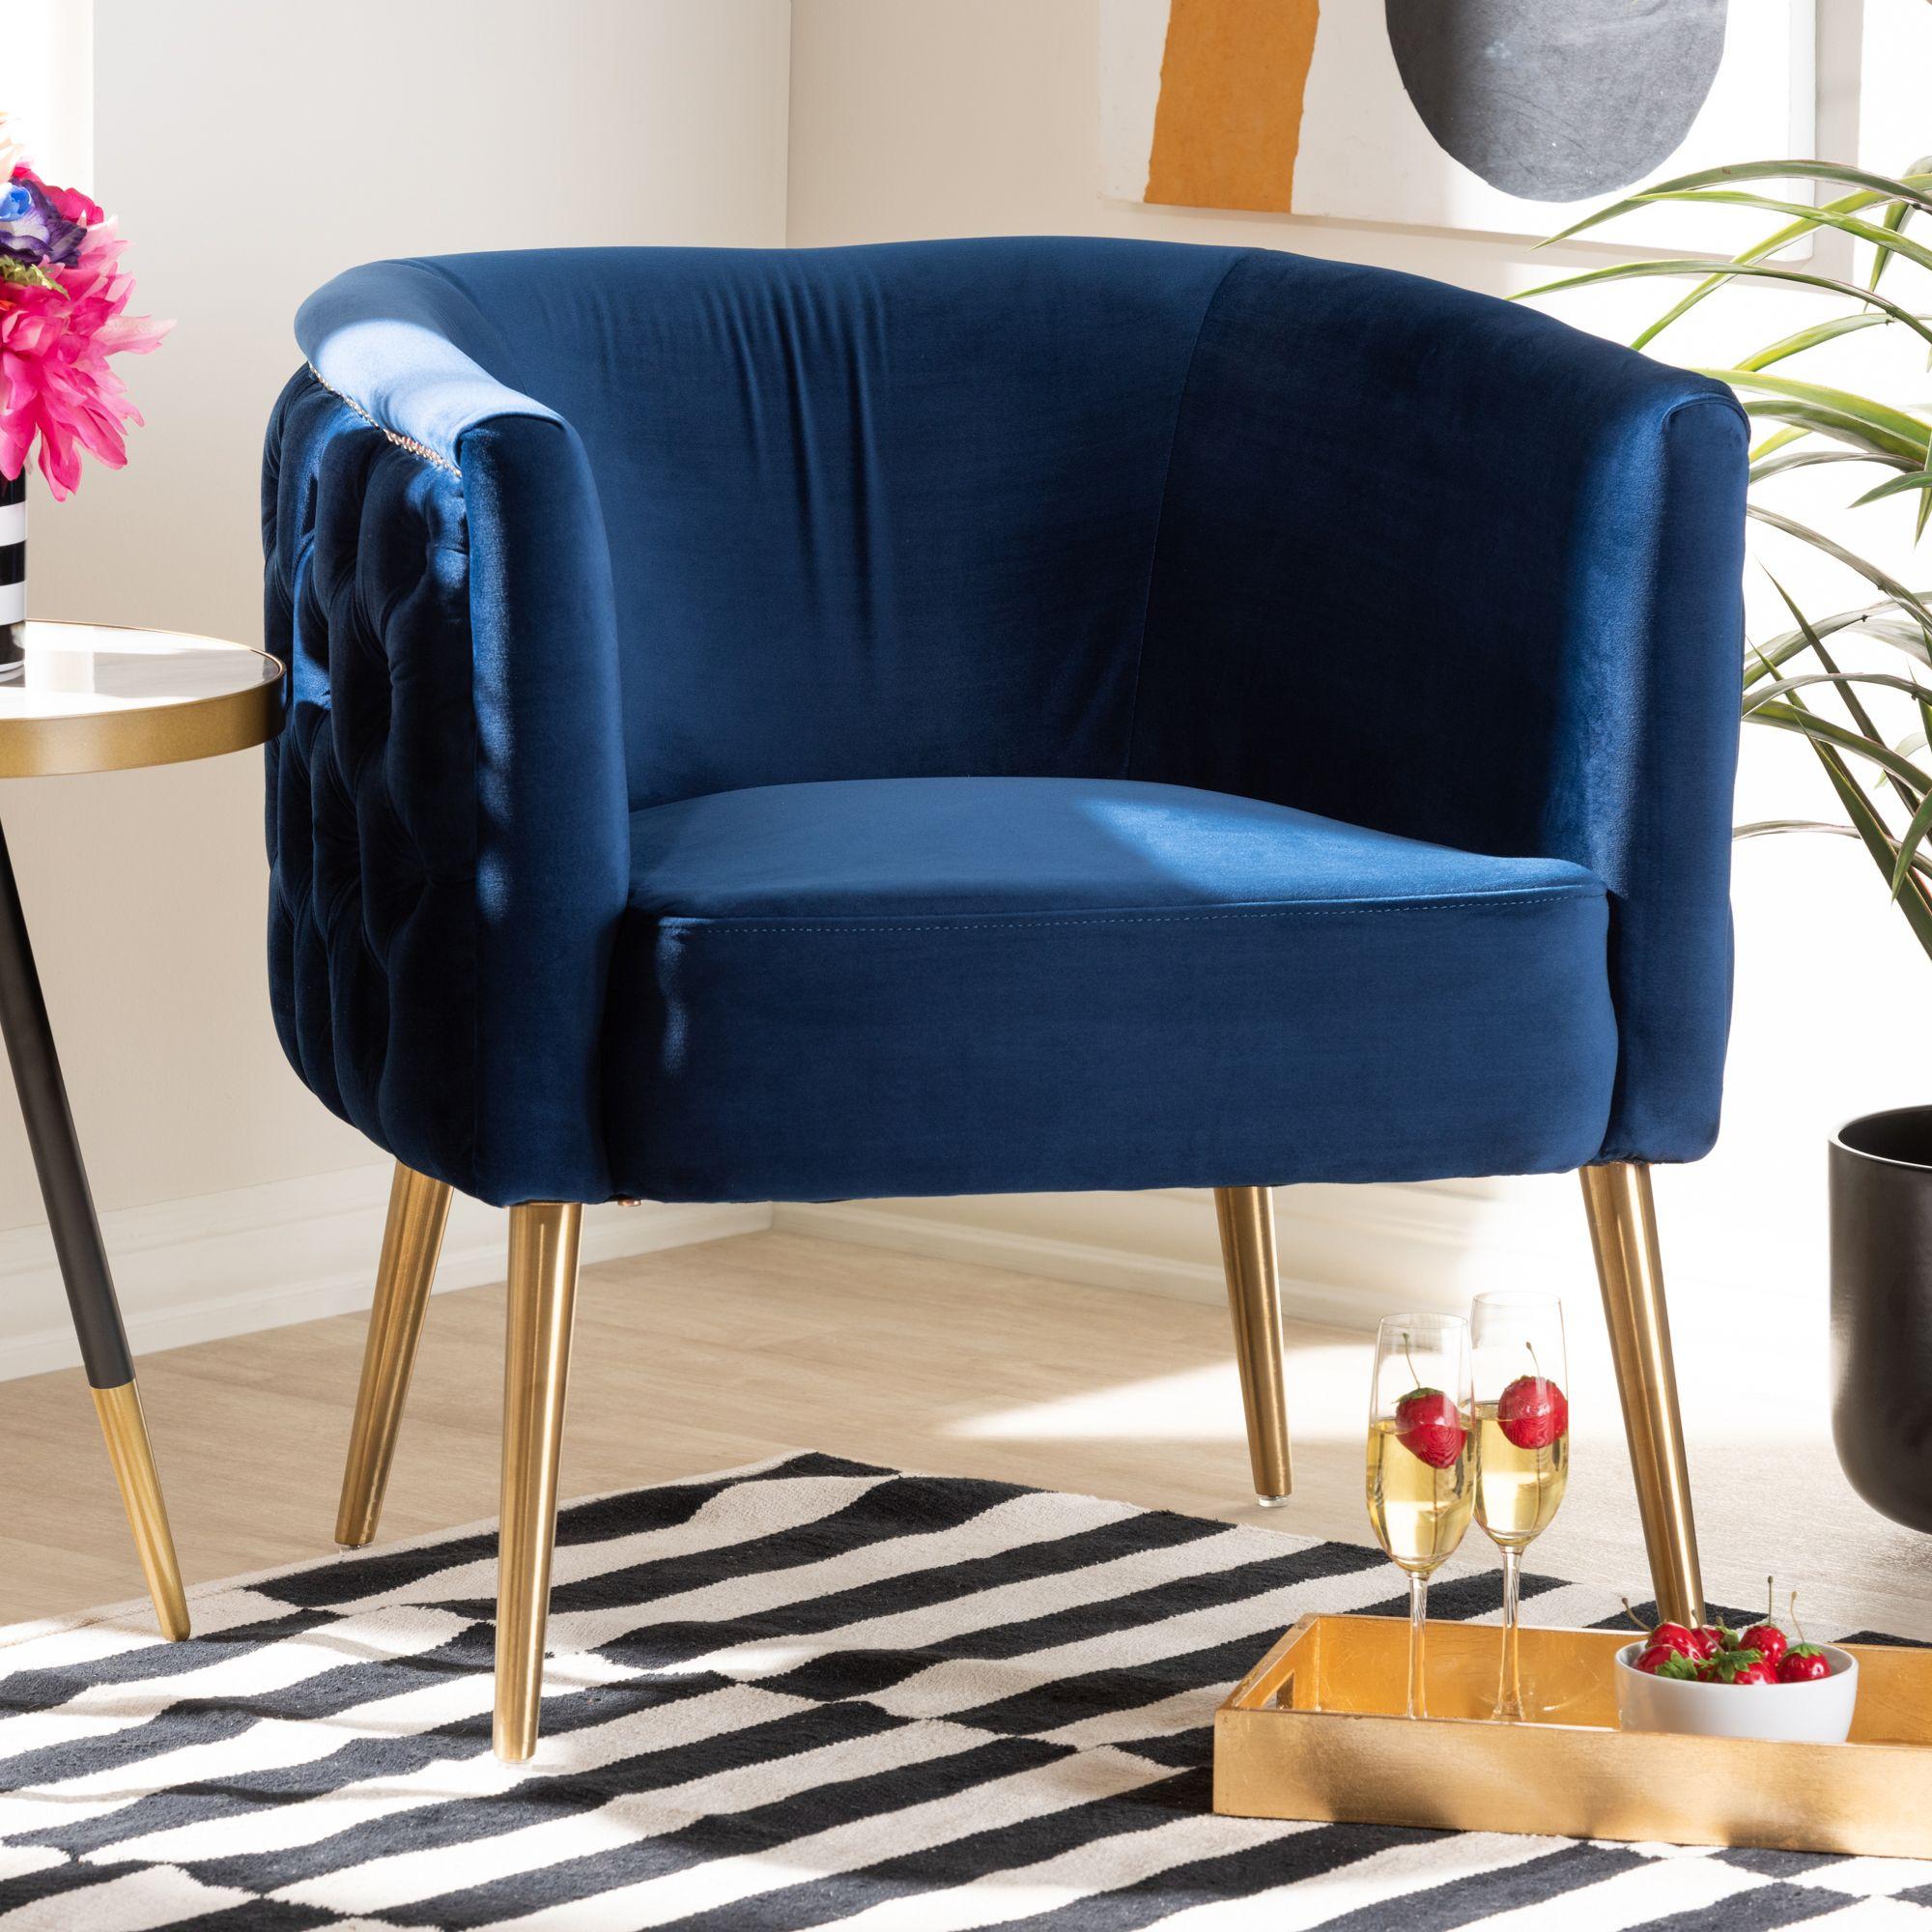 Baxton Studio Marcelle Glam and Luxe Navy Blue Velvet